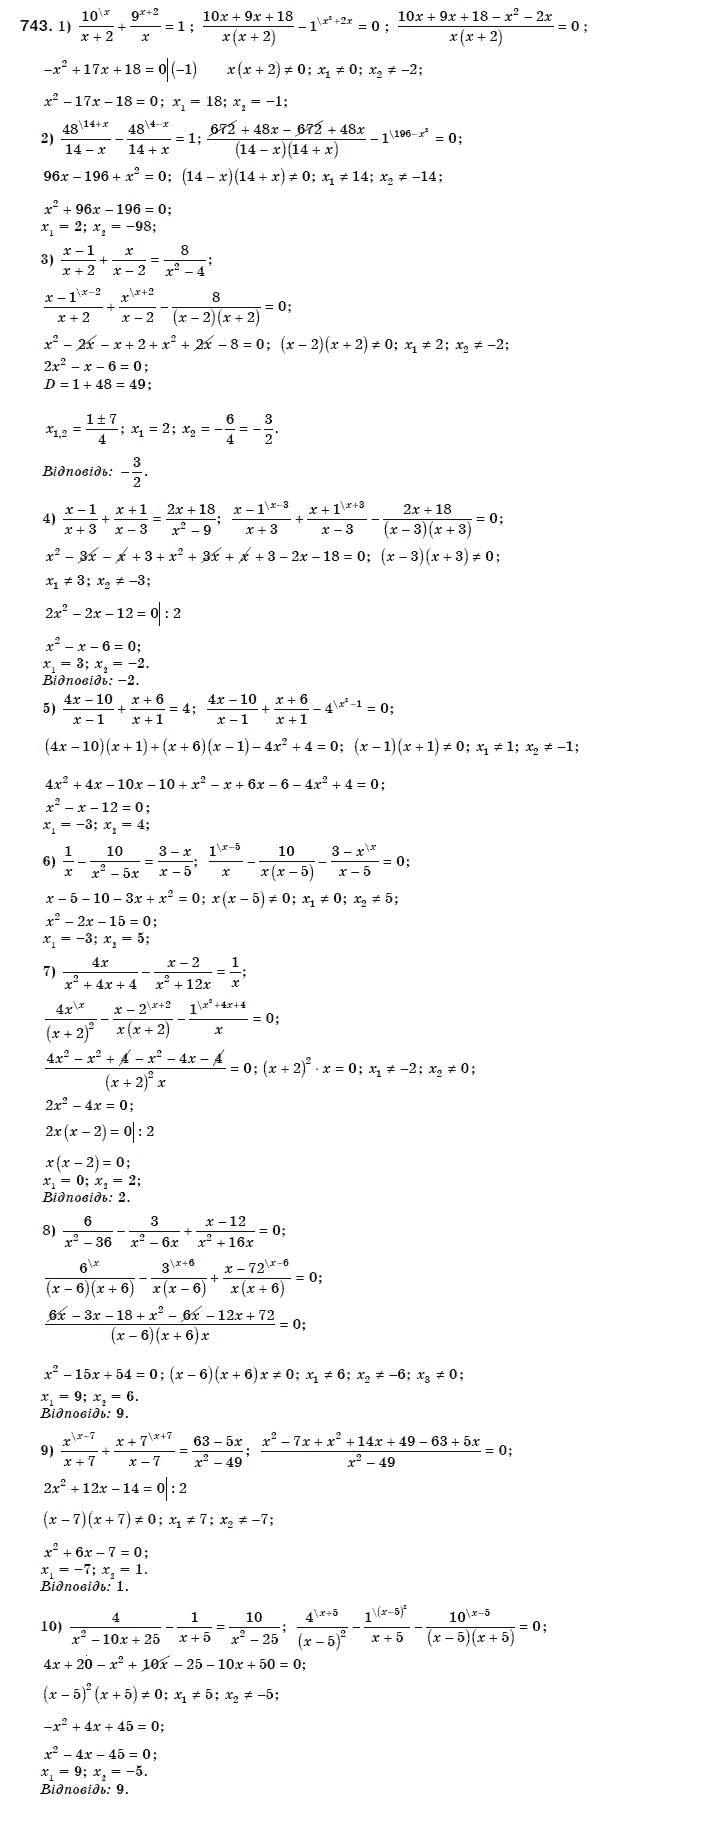 Гдз по алгебре 8 класс номер 743